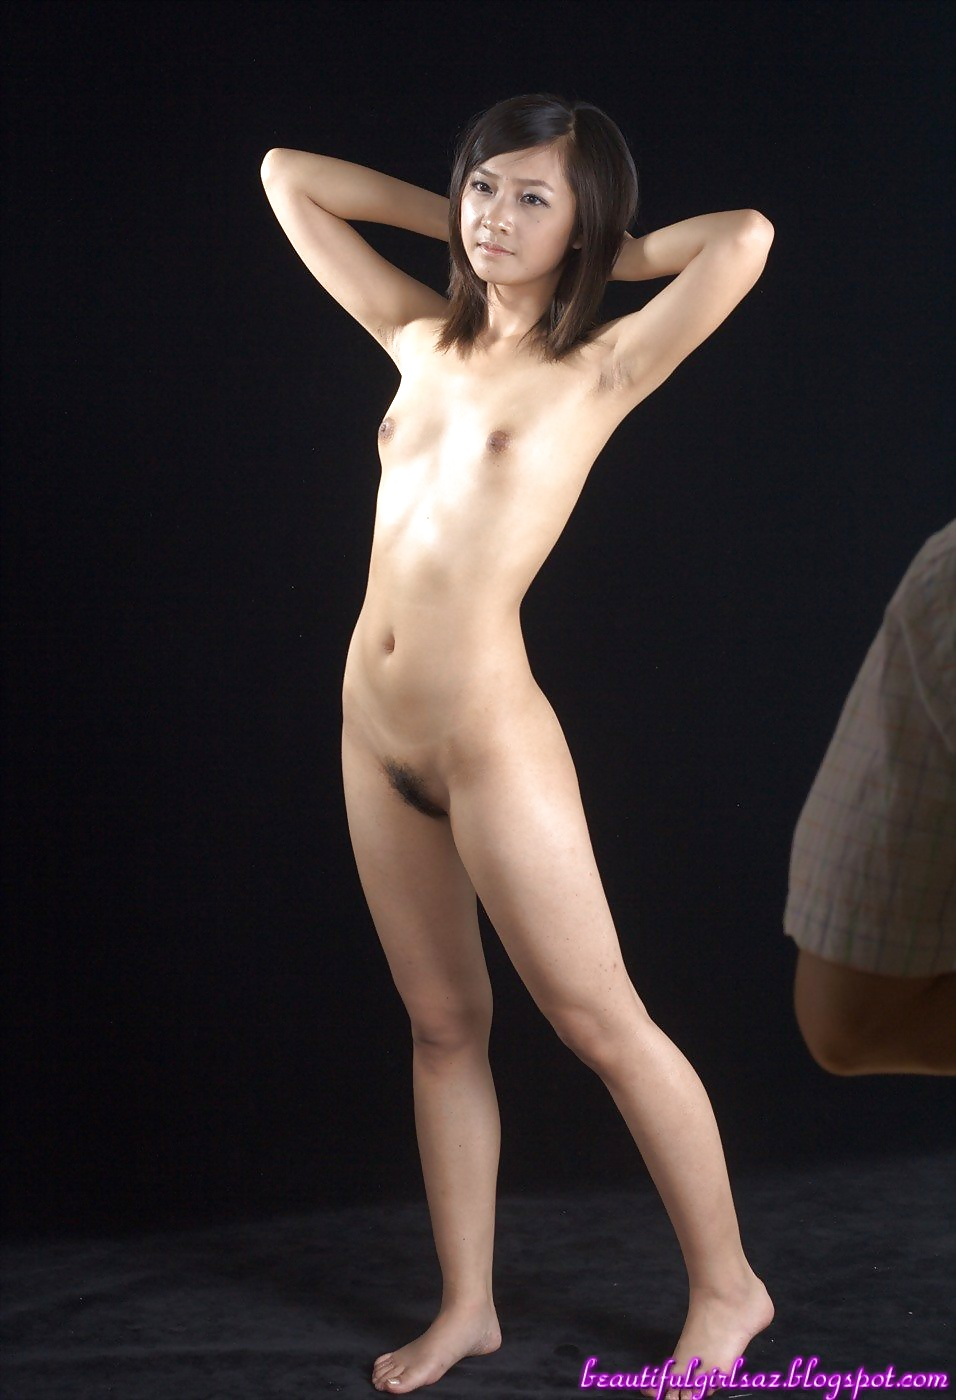 Taiwan Young Girl Nude For Art - 8 Pics - Xhamstercom-7930